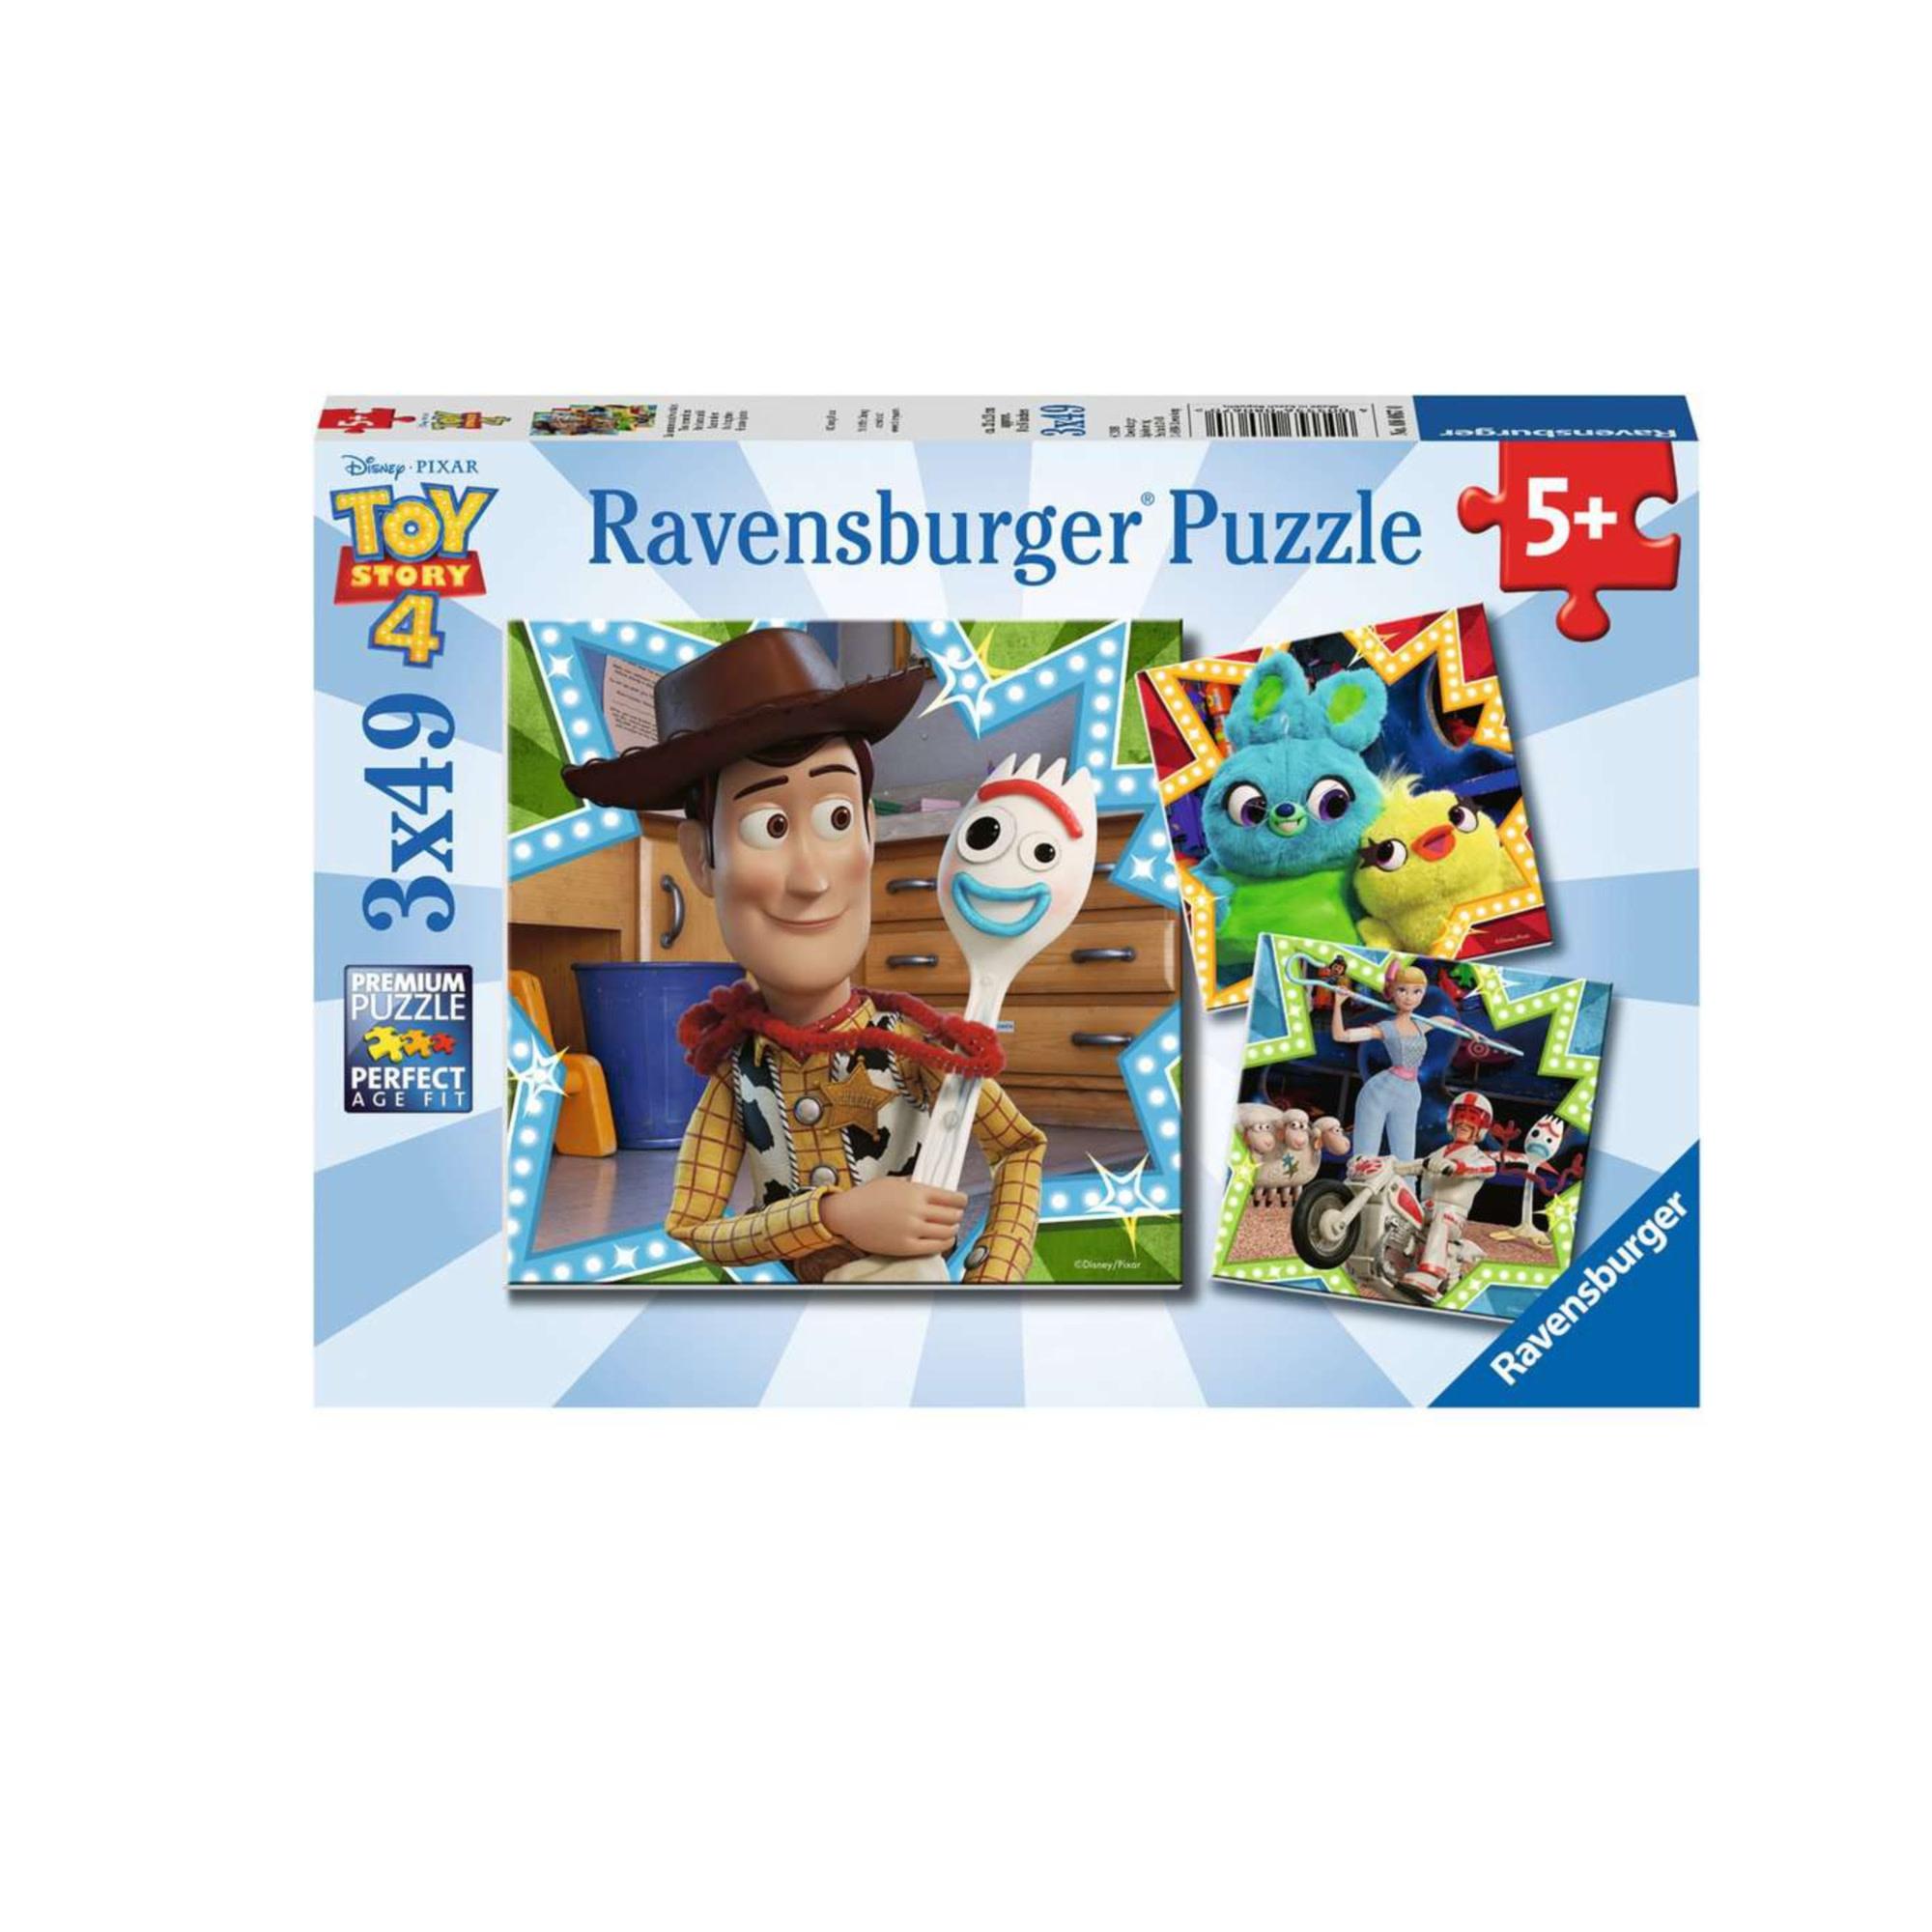 Toy Story 4 Tous ensemble 3x49 5+ puzzle